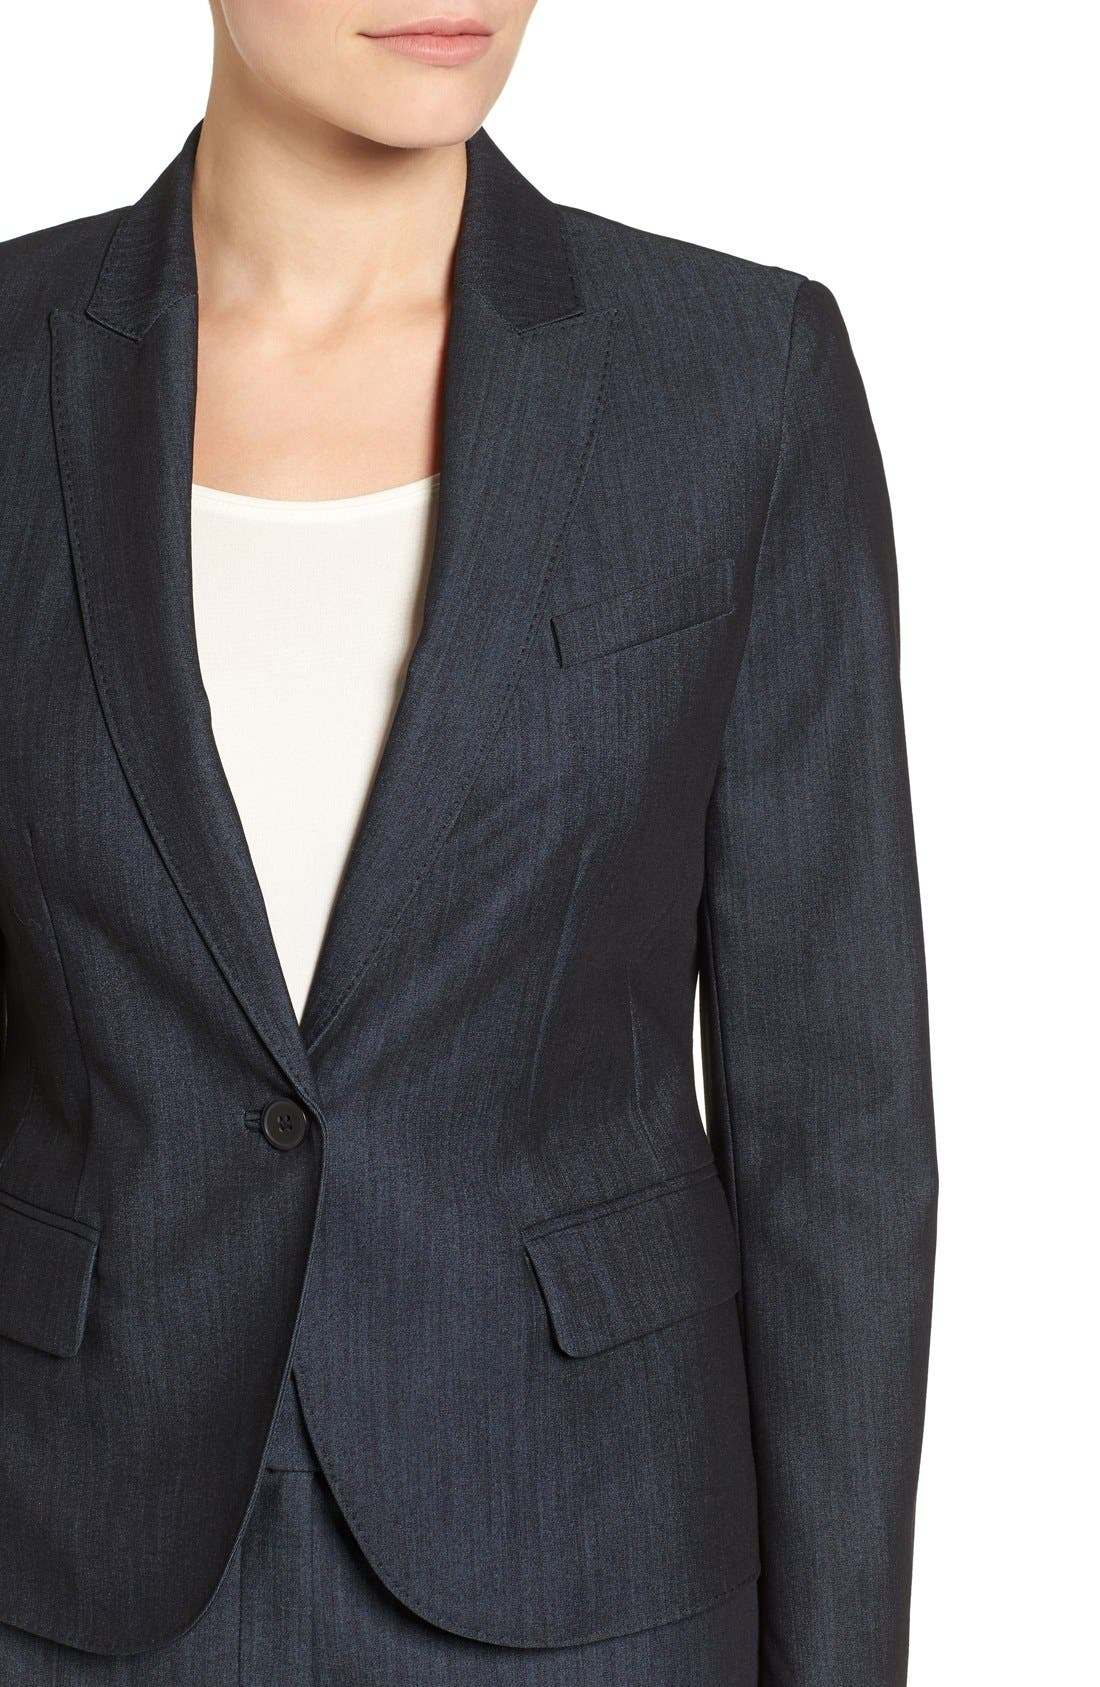 Twill One-Button Jacket,                             Alternate thumbnail 5, color,                             Indigo Twill